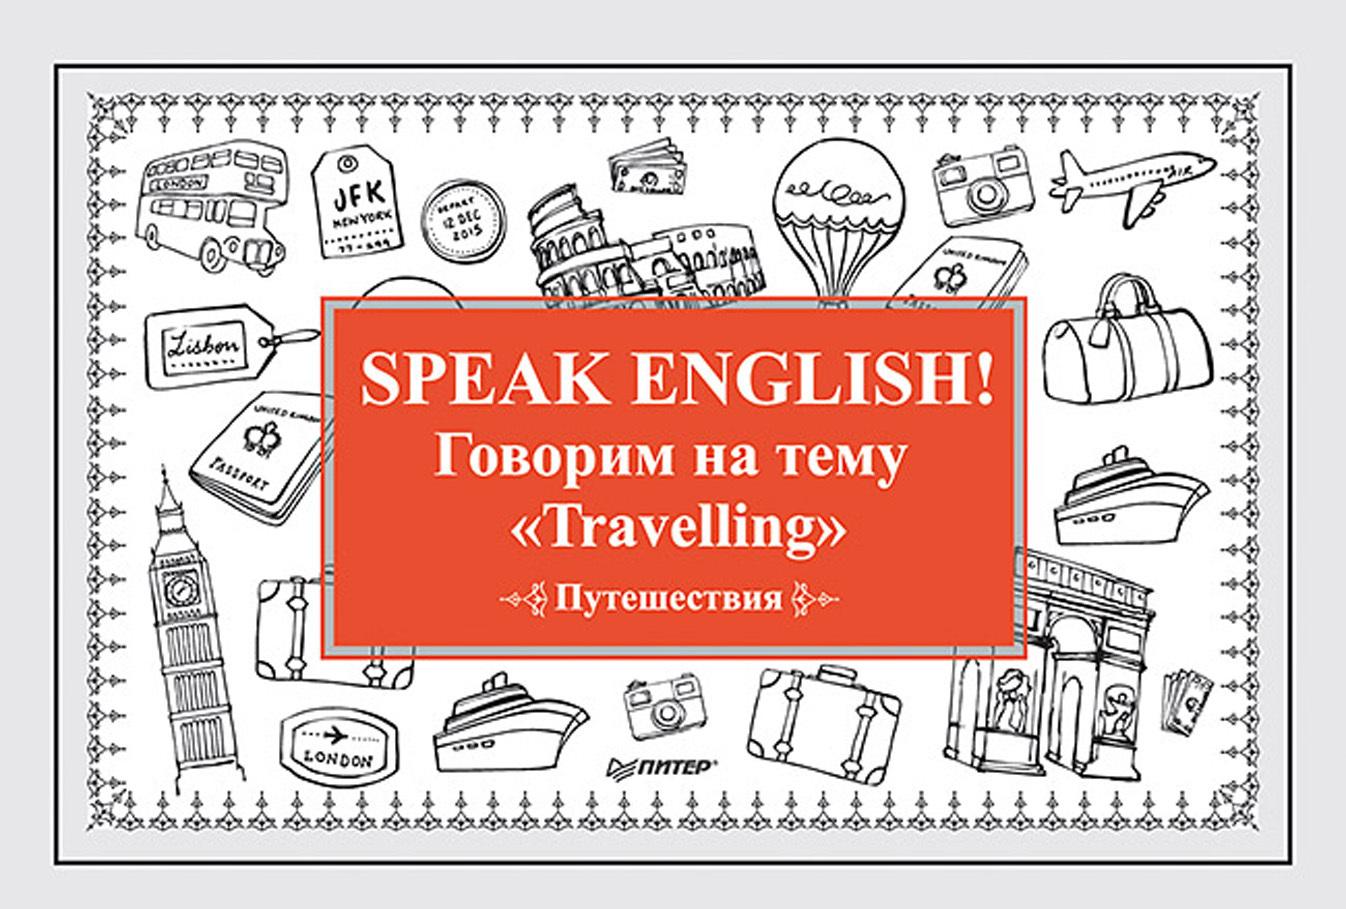 Е. Андронова. Speak English! Говорим на тему «Travelling» (Путешествия)